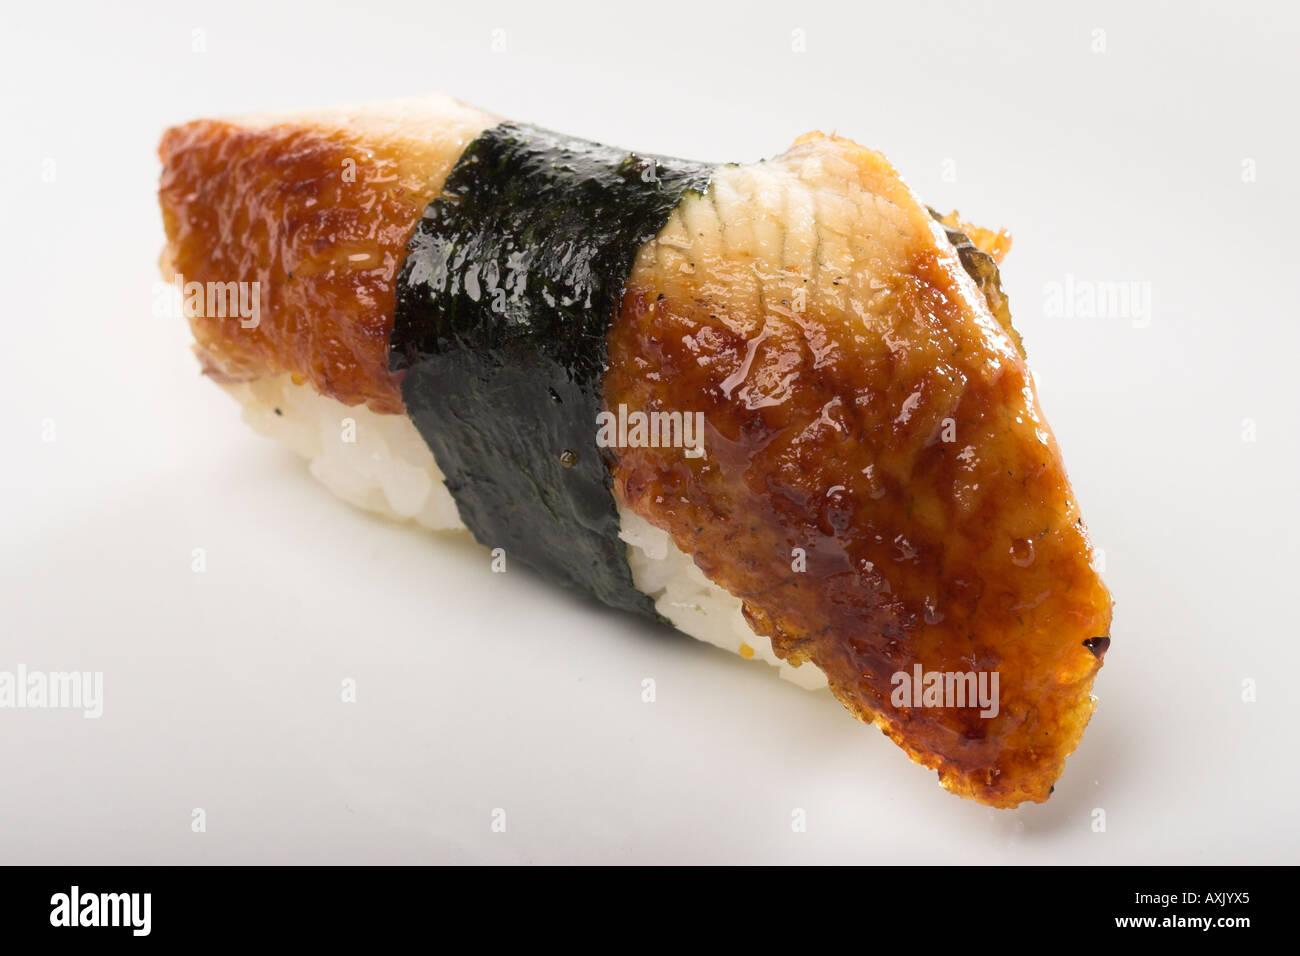 unagi eel fresh seafood brown white fish seaweed rice rapped appetizer meal Asian consumption eat food - Stock Image